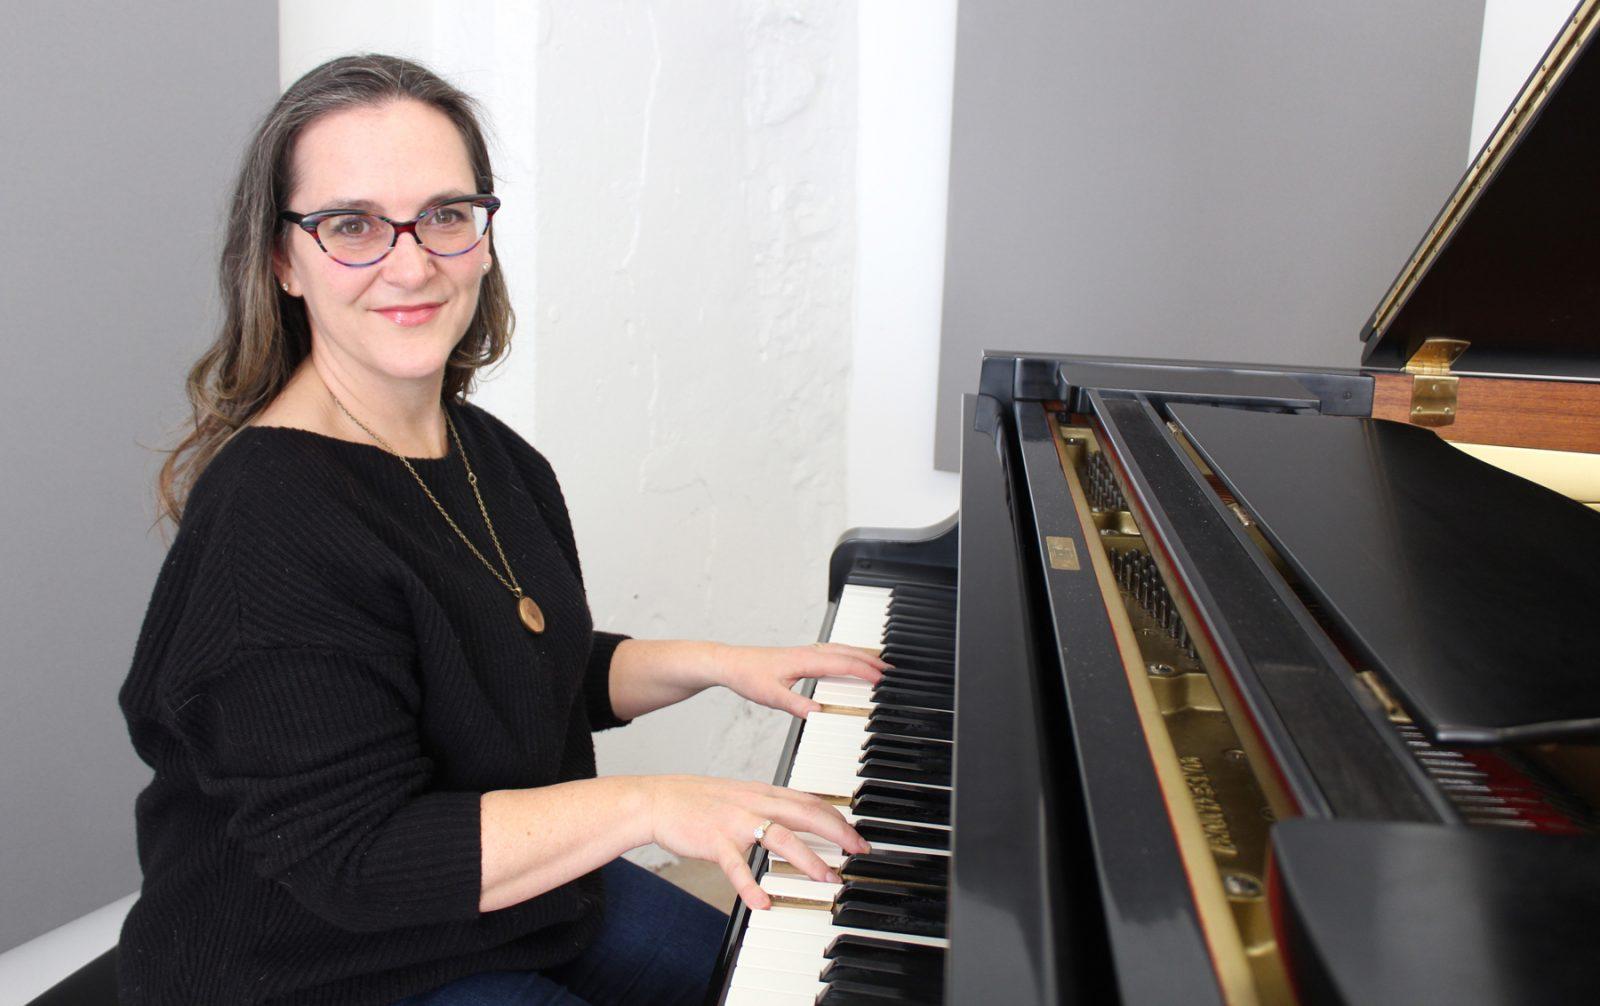 Karin Di Bella